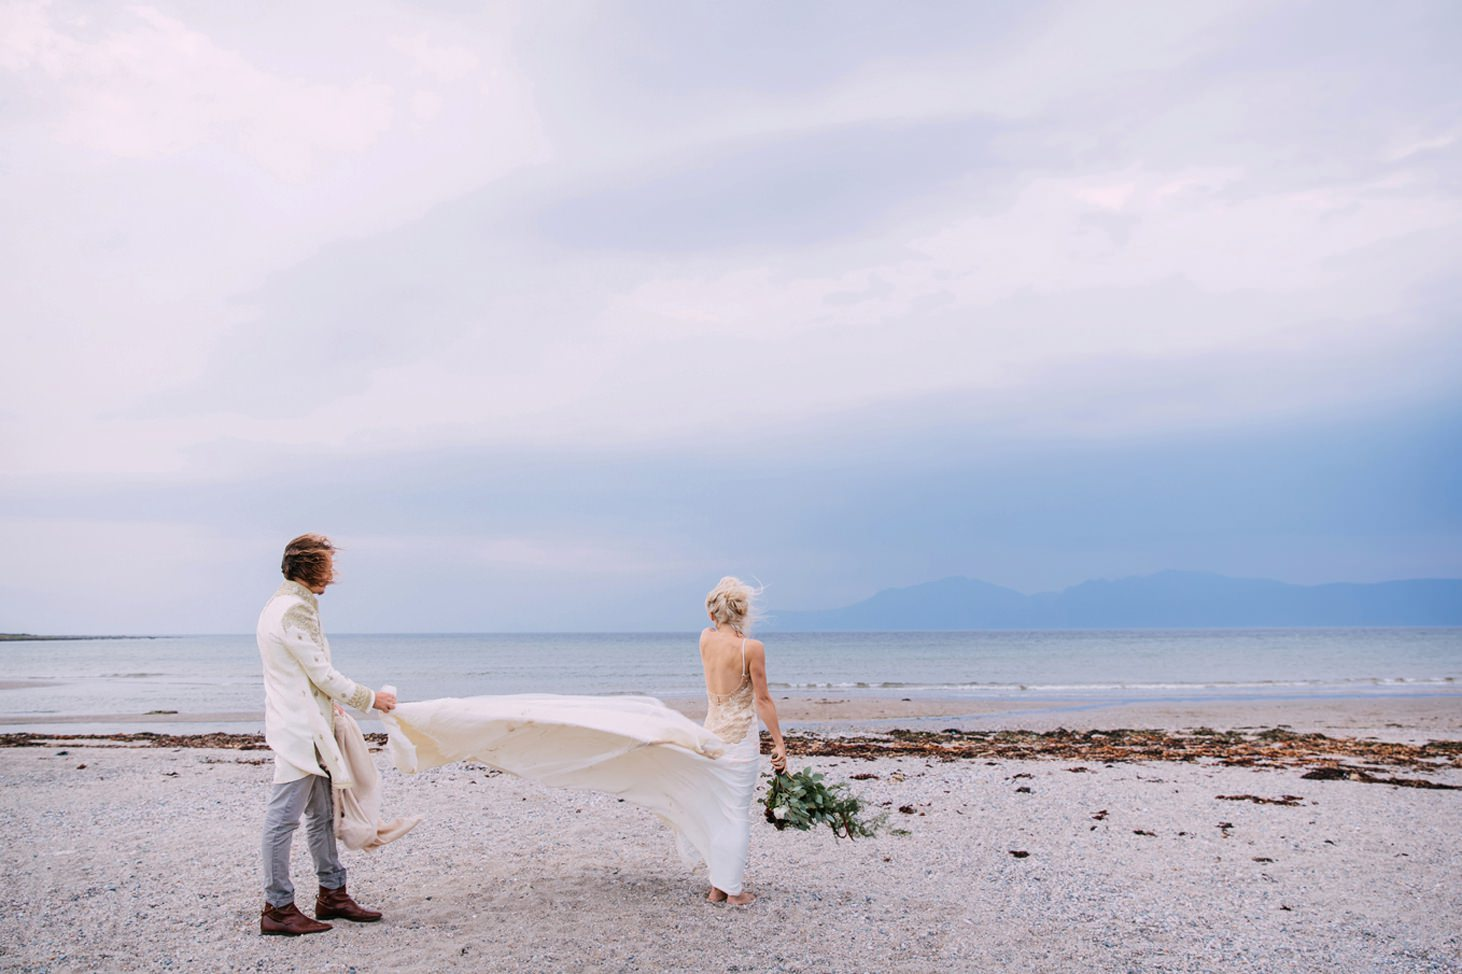 sle of bute wedding photography groom holding bride dress